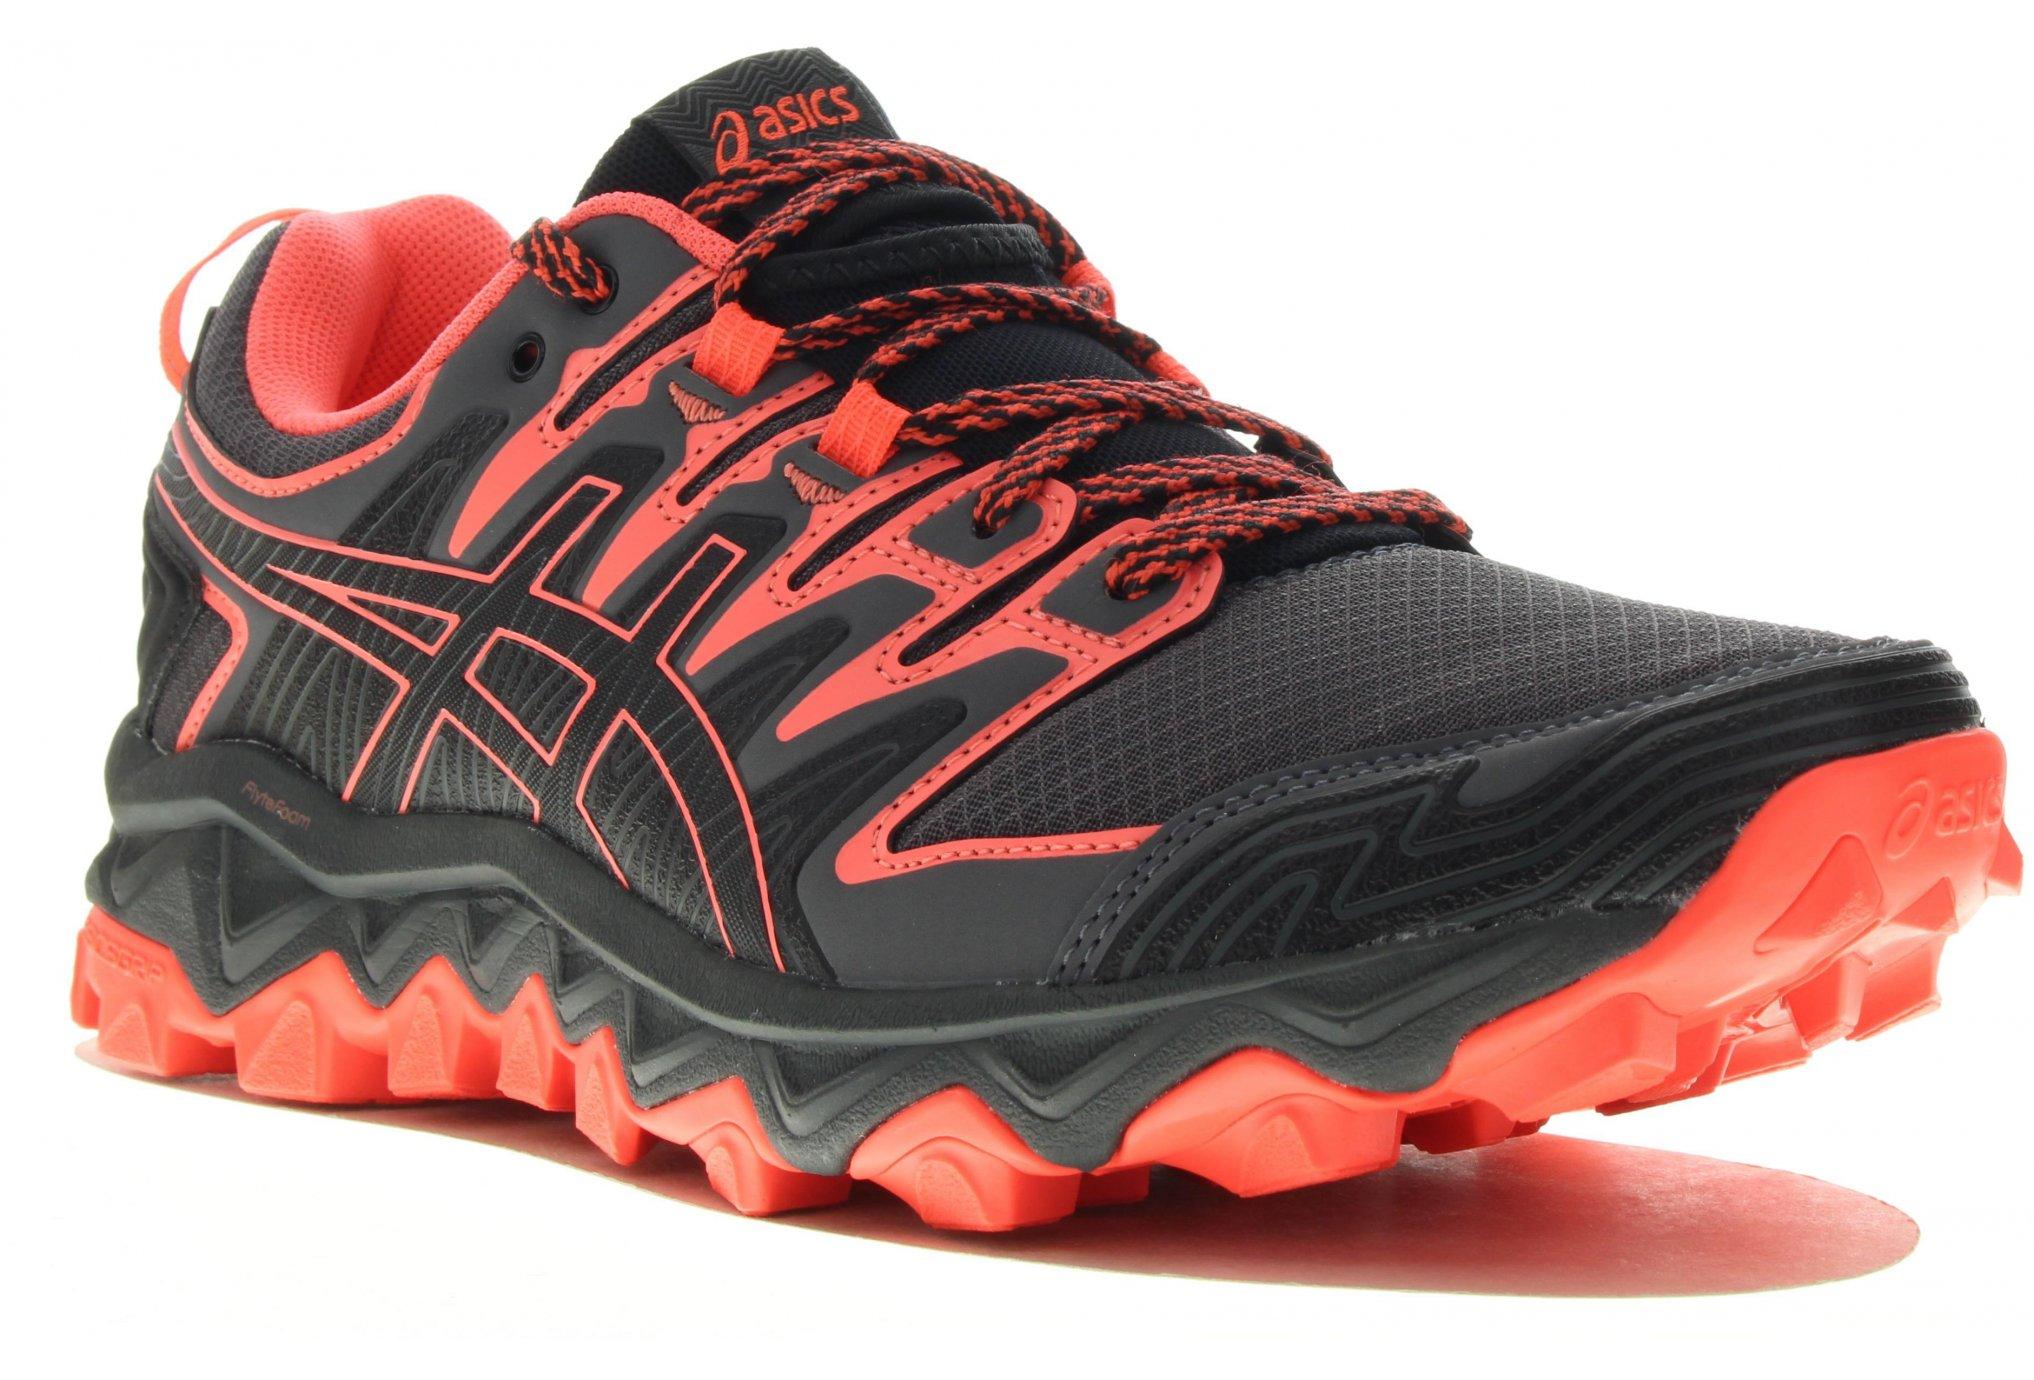 Asics Gel-Fuji Trabuco 7 W Chaussures running femme